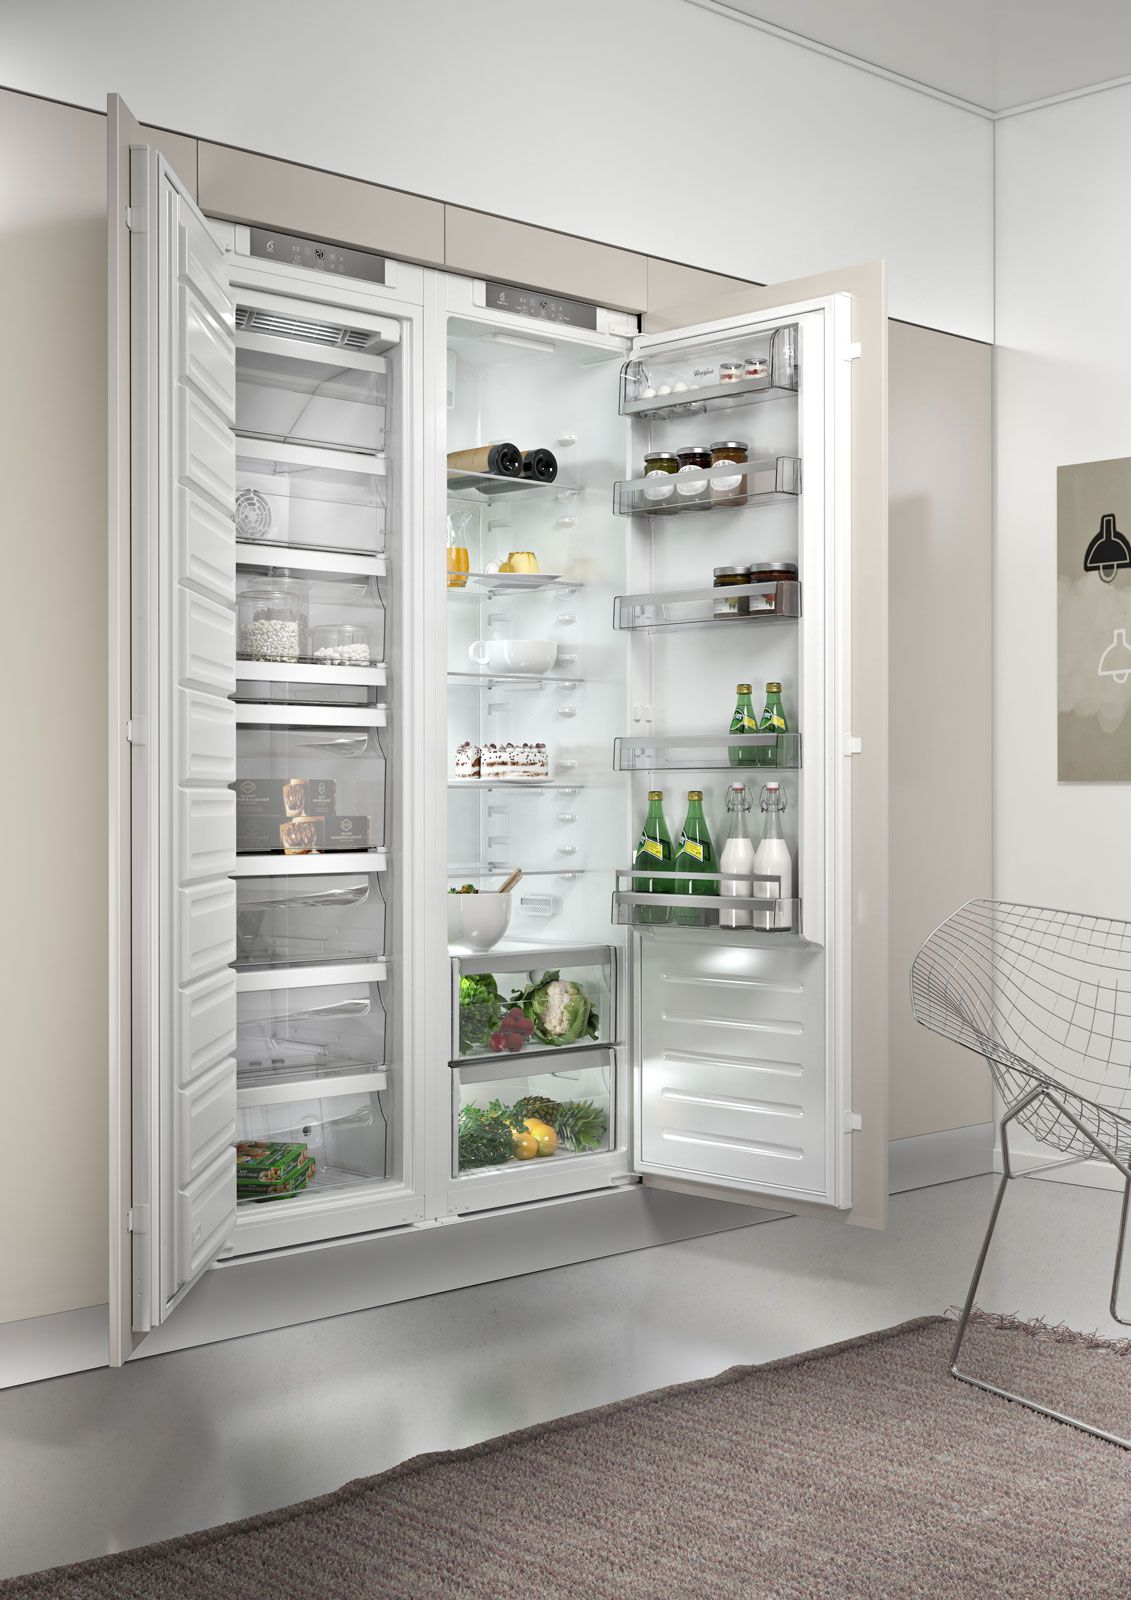 Frigo incasso whirpool | A - Home - kitchen appliance | Pinterest ...